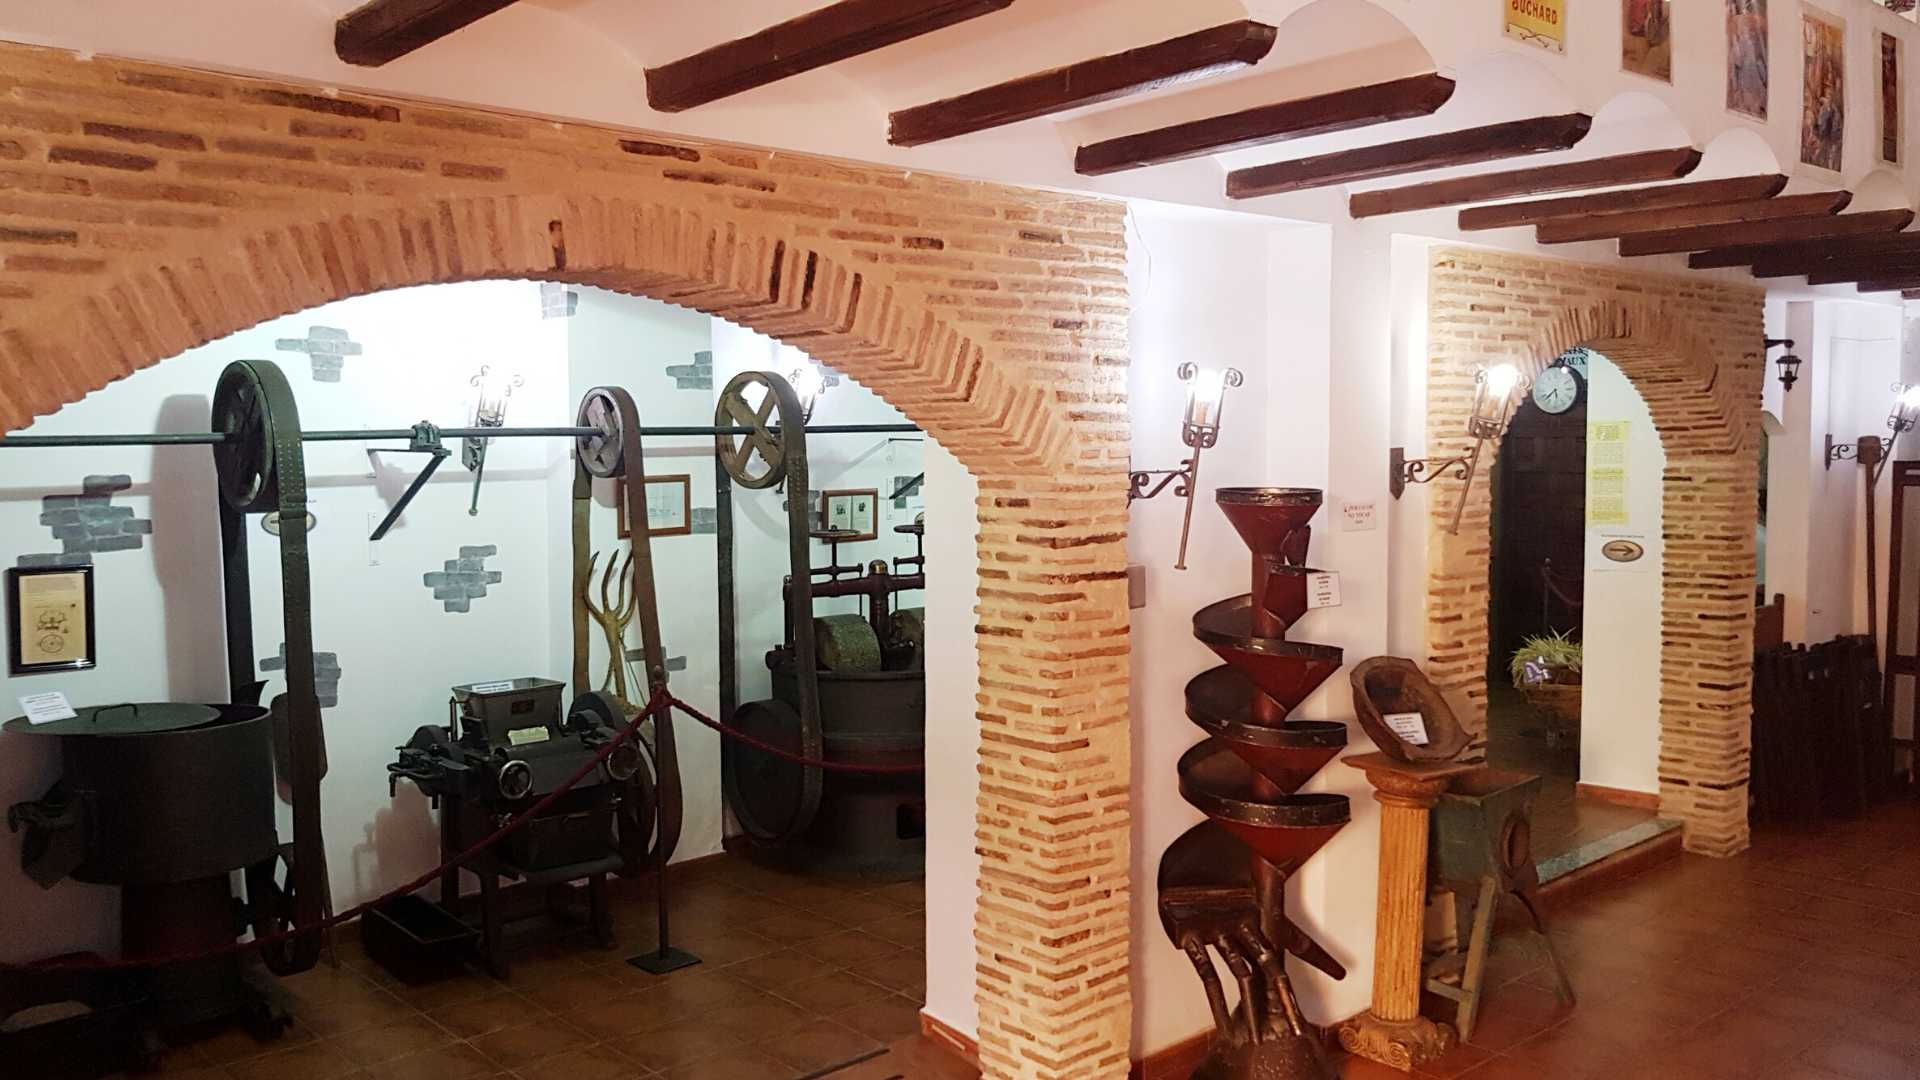 Visita guiada al Museo del Chocolate (Visite guidée au Musée du chocolat )